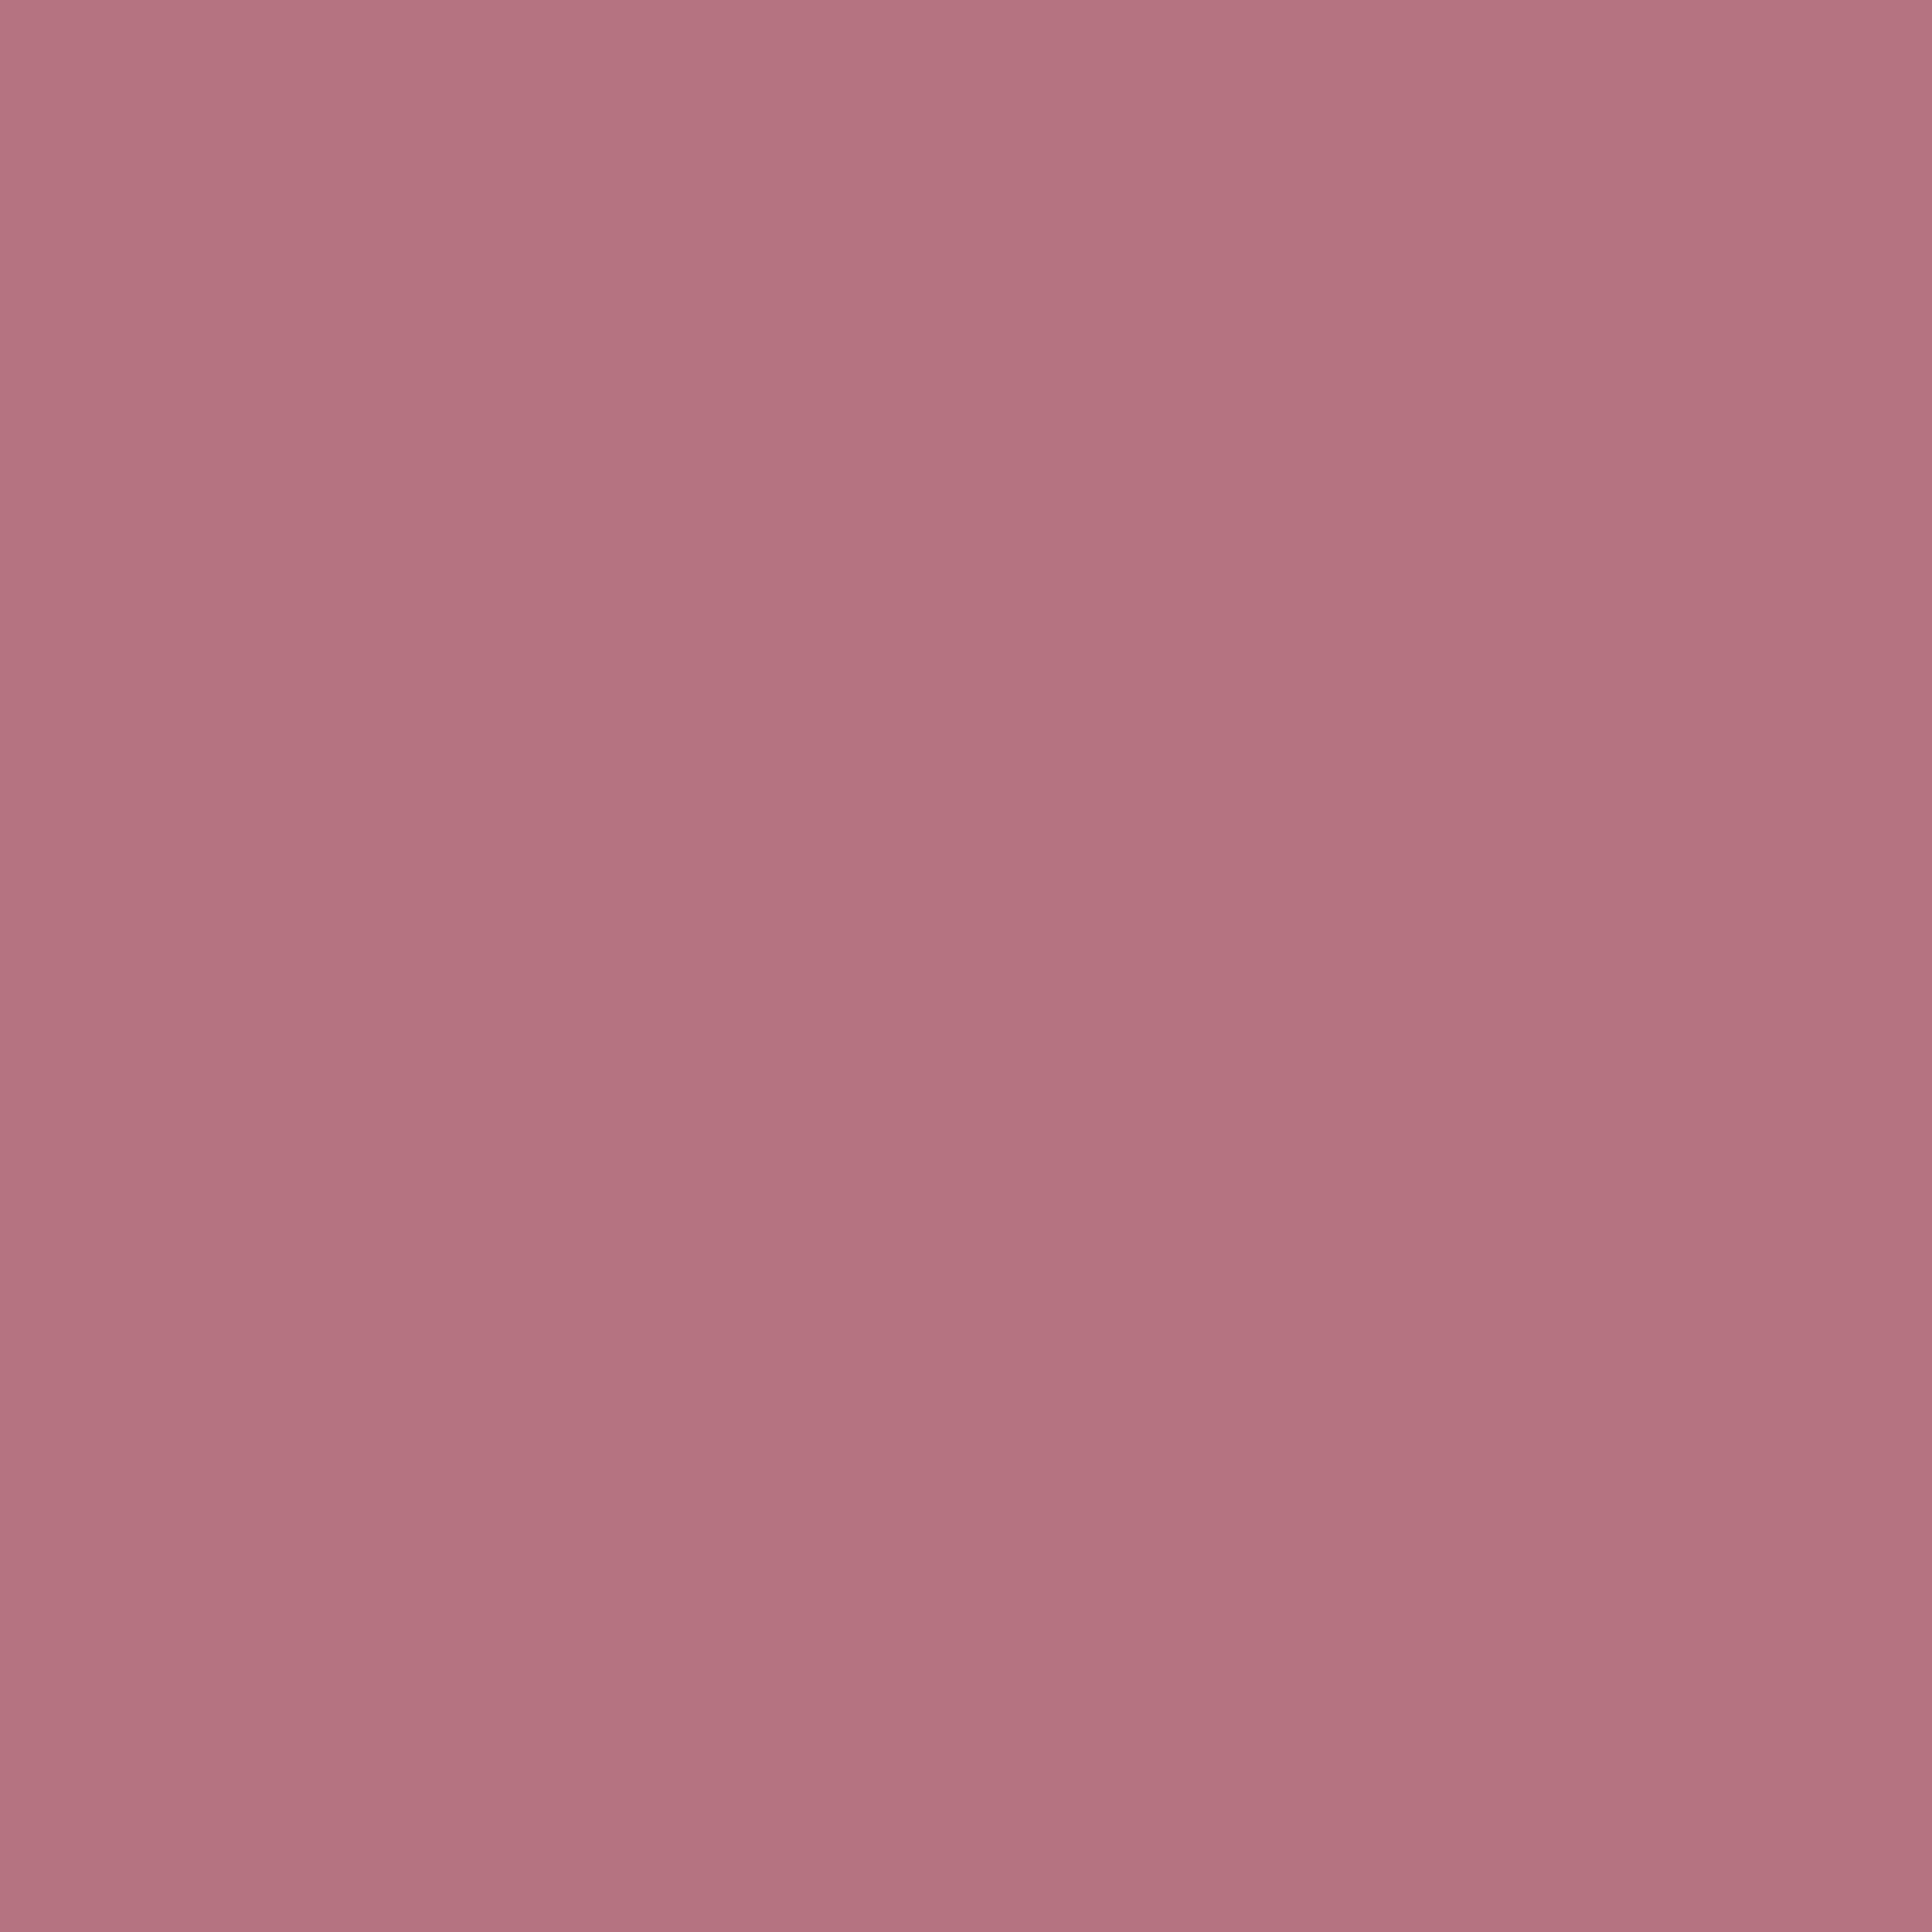 3600x3600 Turkish Rose Solid Color Background